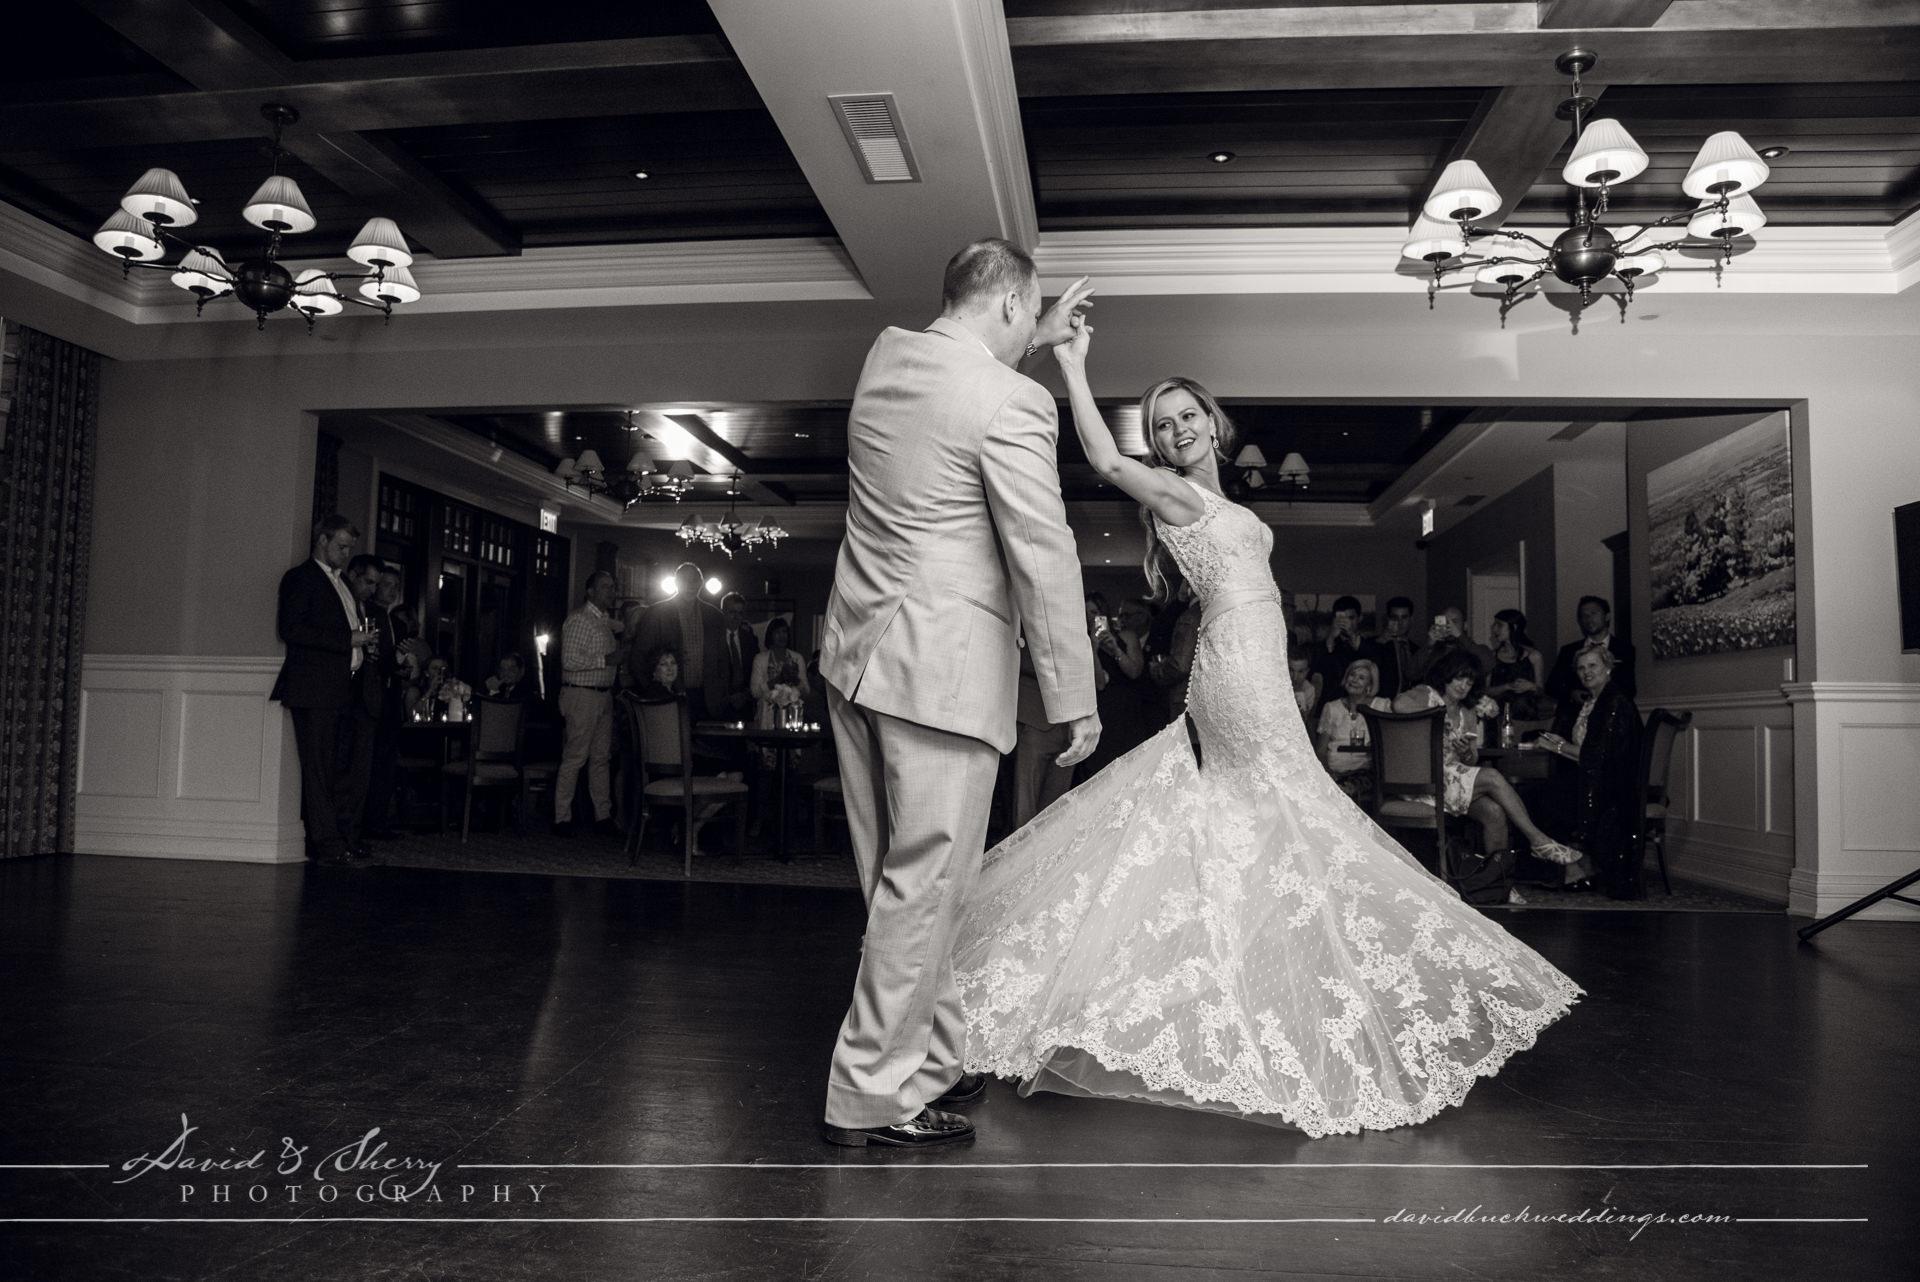 Cobble_Beach_Wedding_Photography_Owen_Sound_42